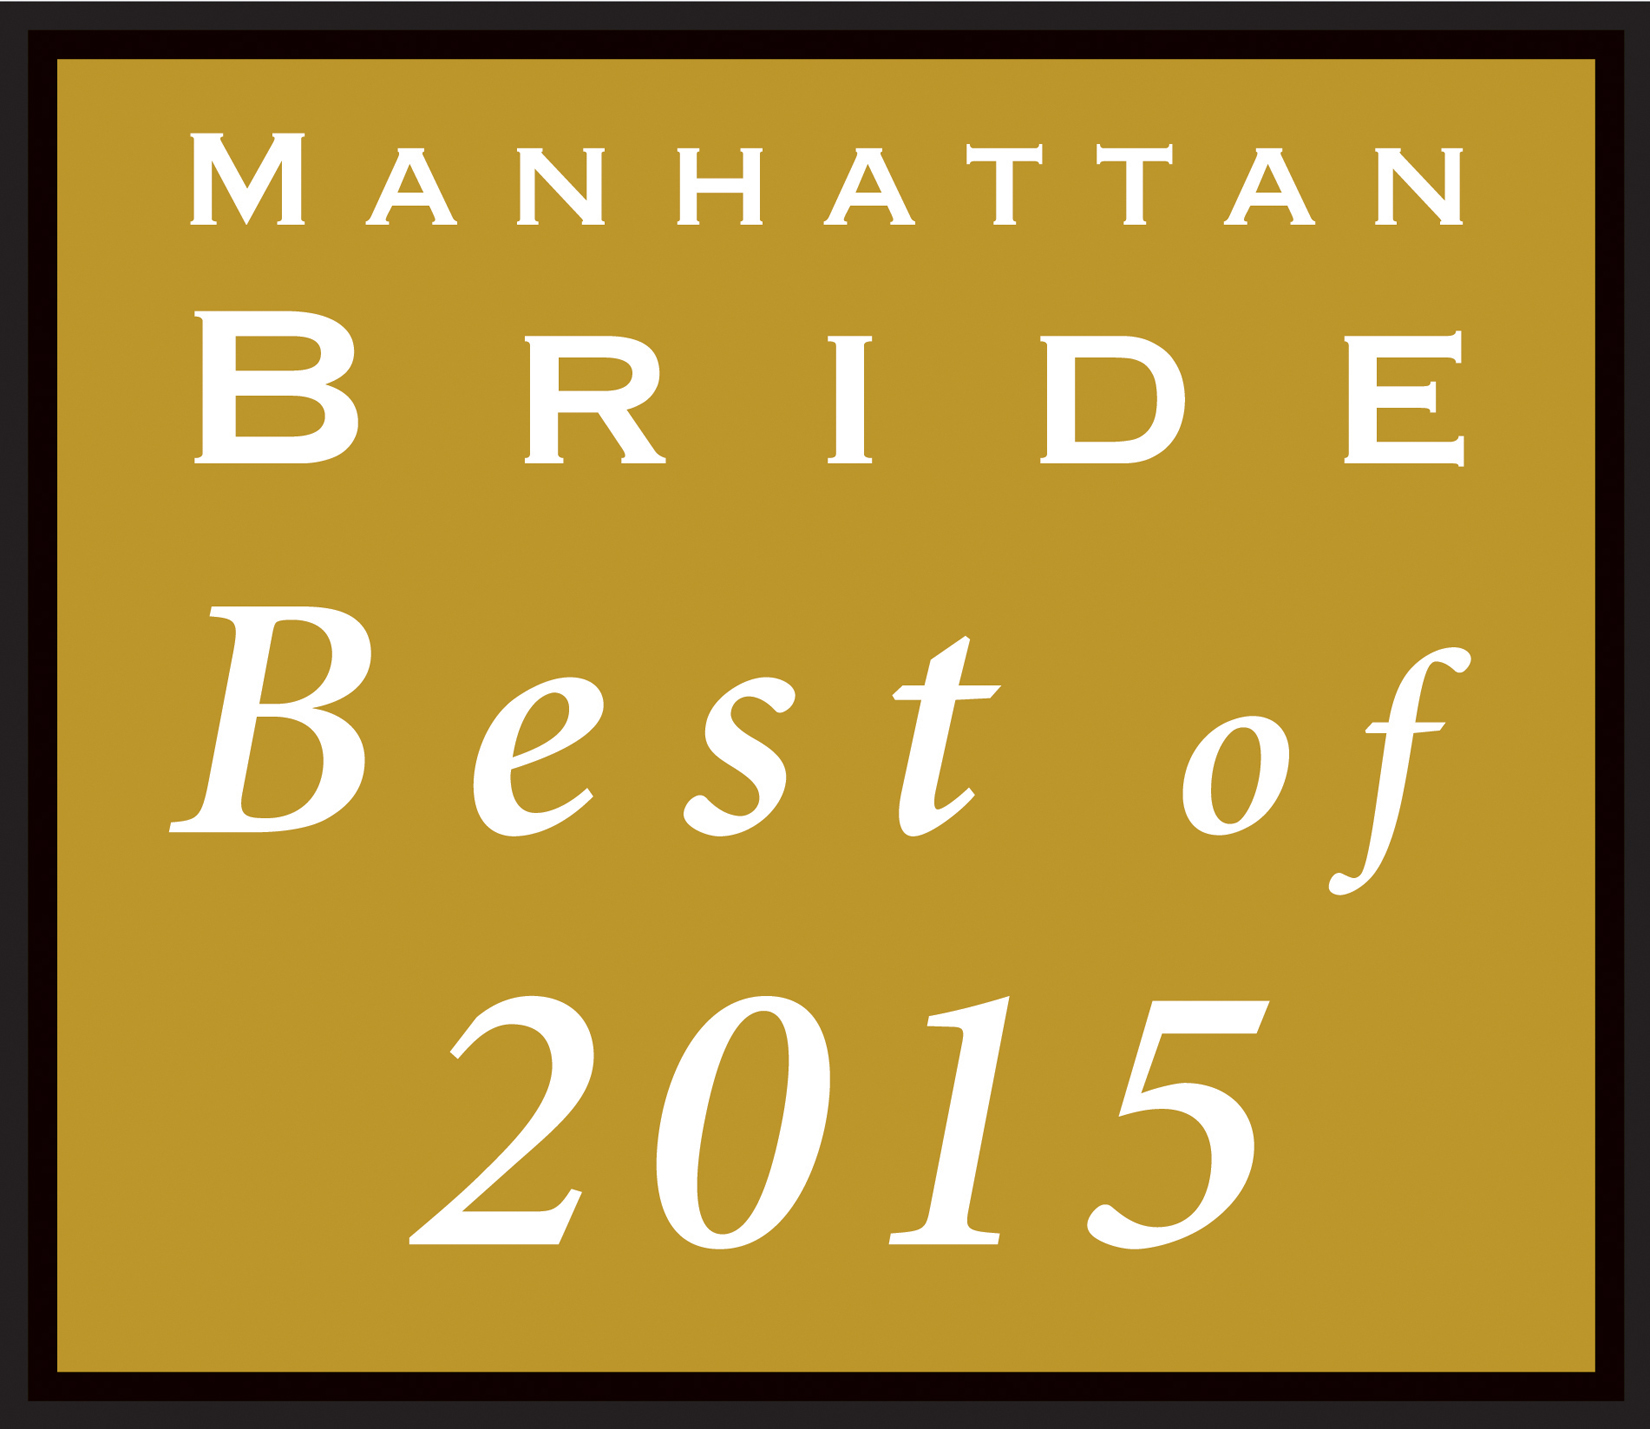 Best-of-Award-2015-HiRes-5pt5-RGB-WEB.jpg